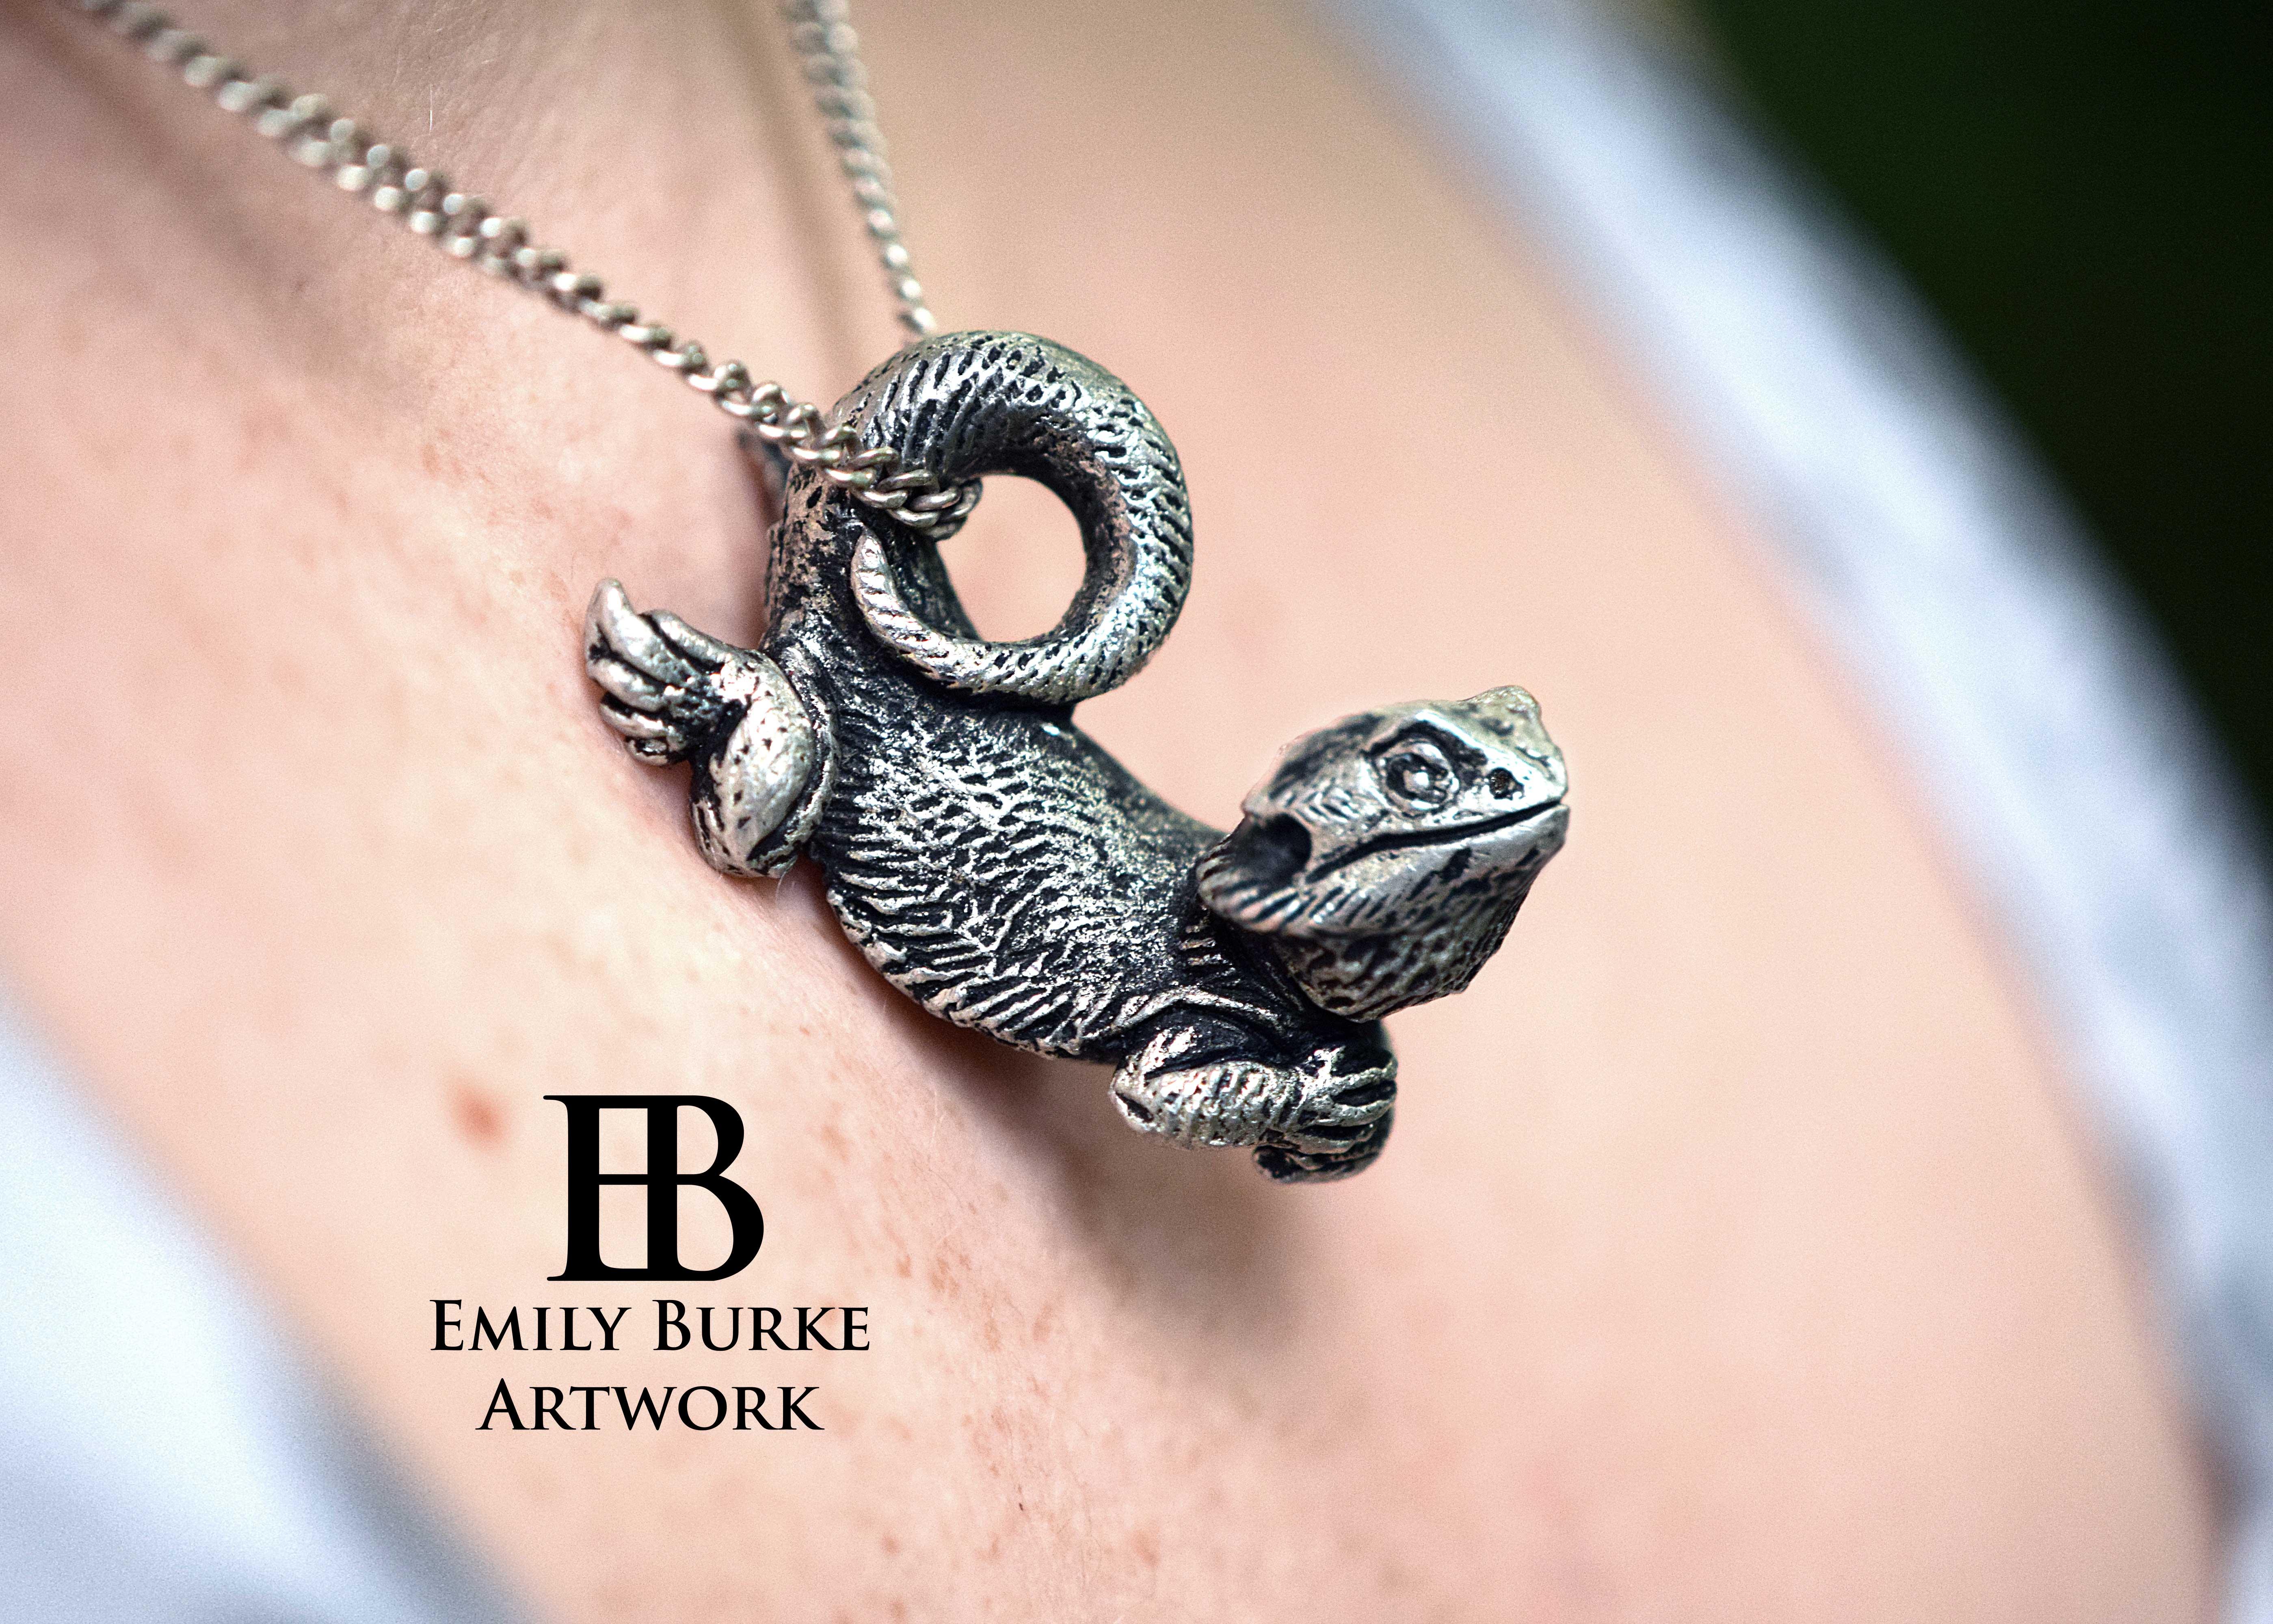 Pewter Bearded Dragon Keychain 183 Emily Burke Artwork